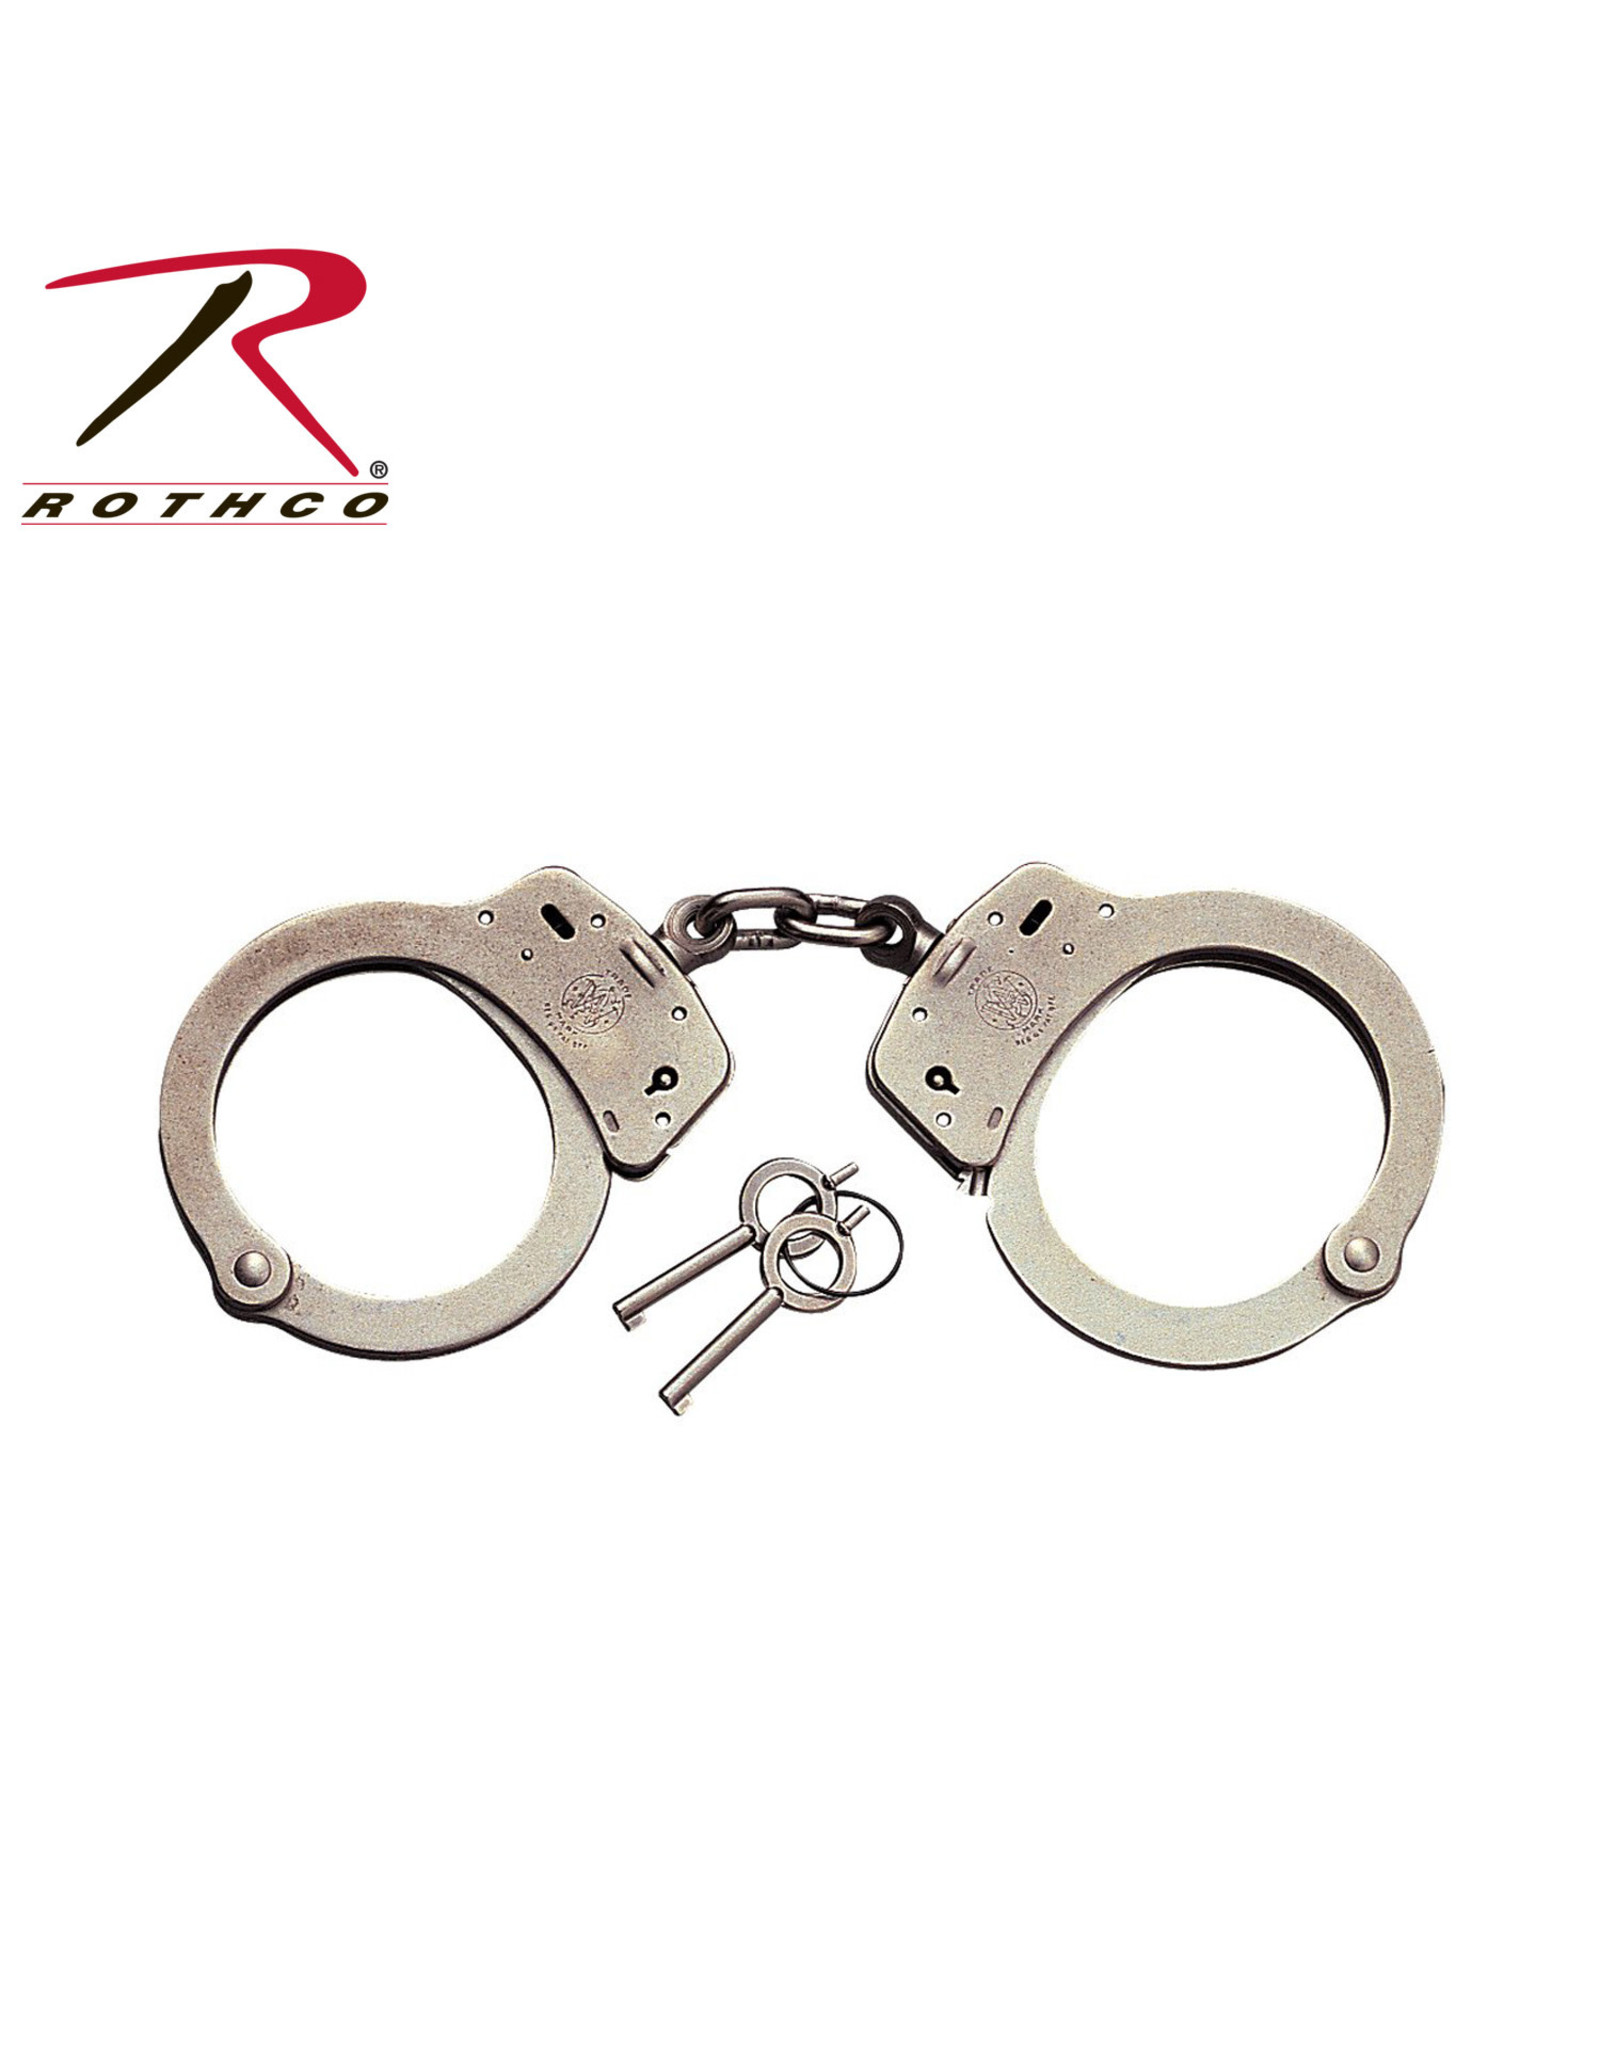 Smith & Wesson Nickel Handcuffs